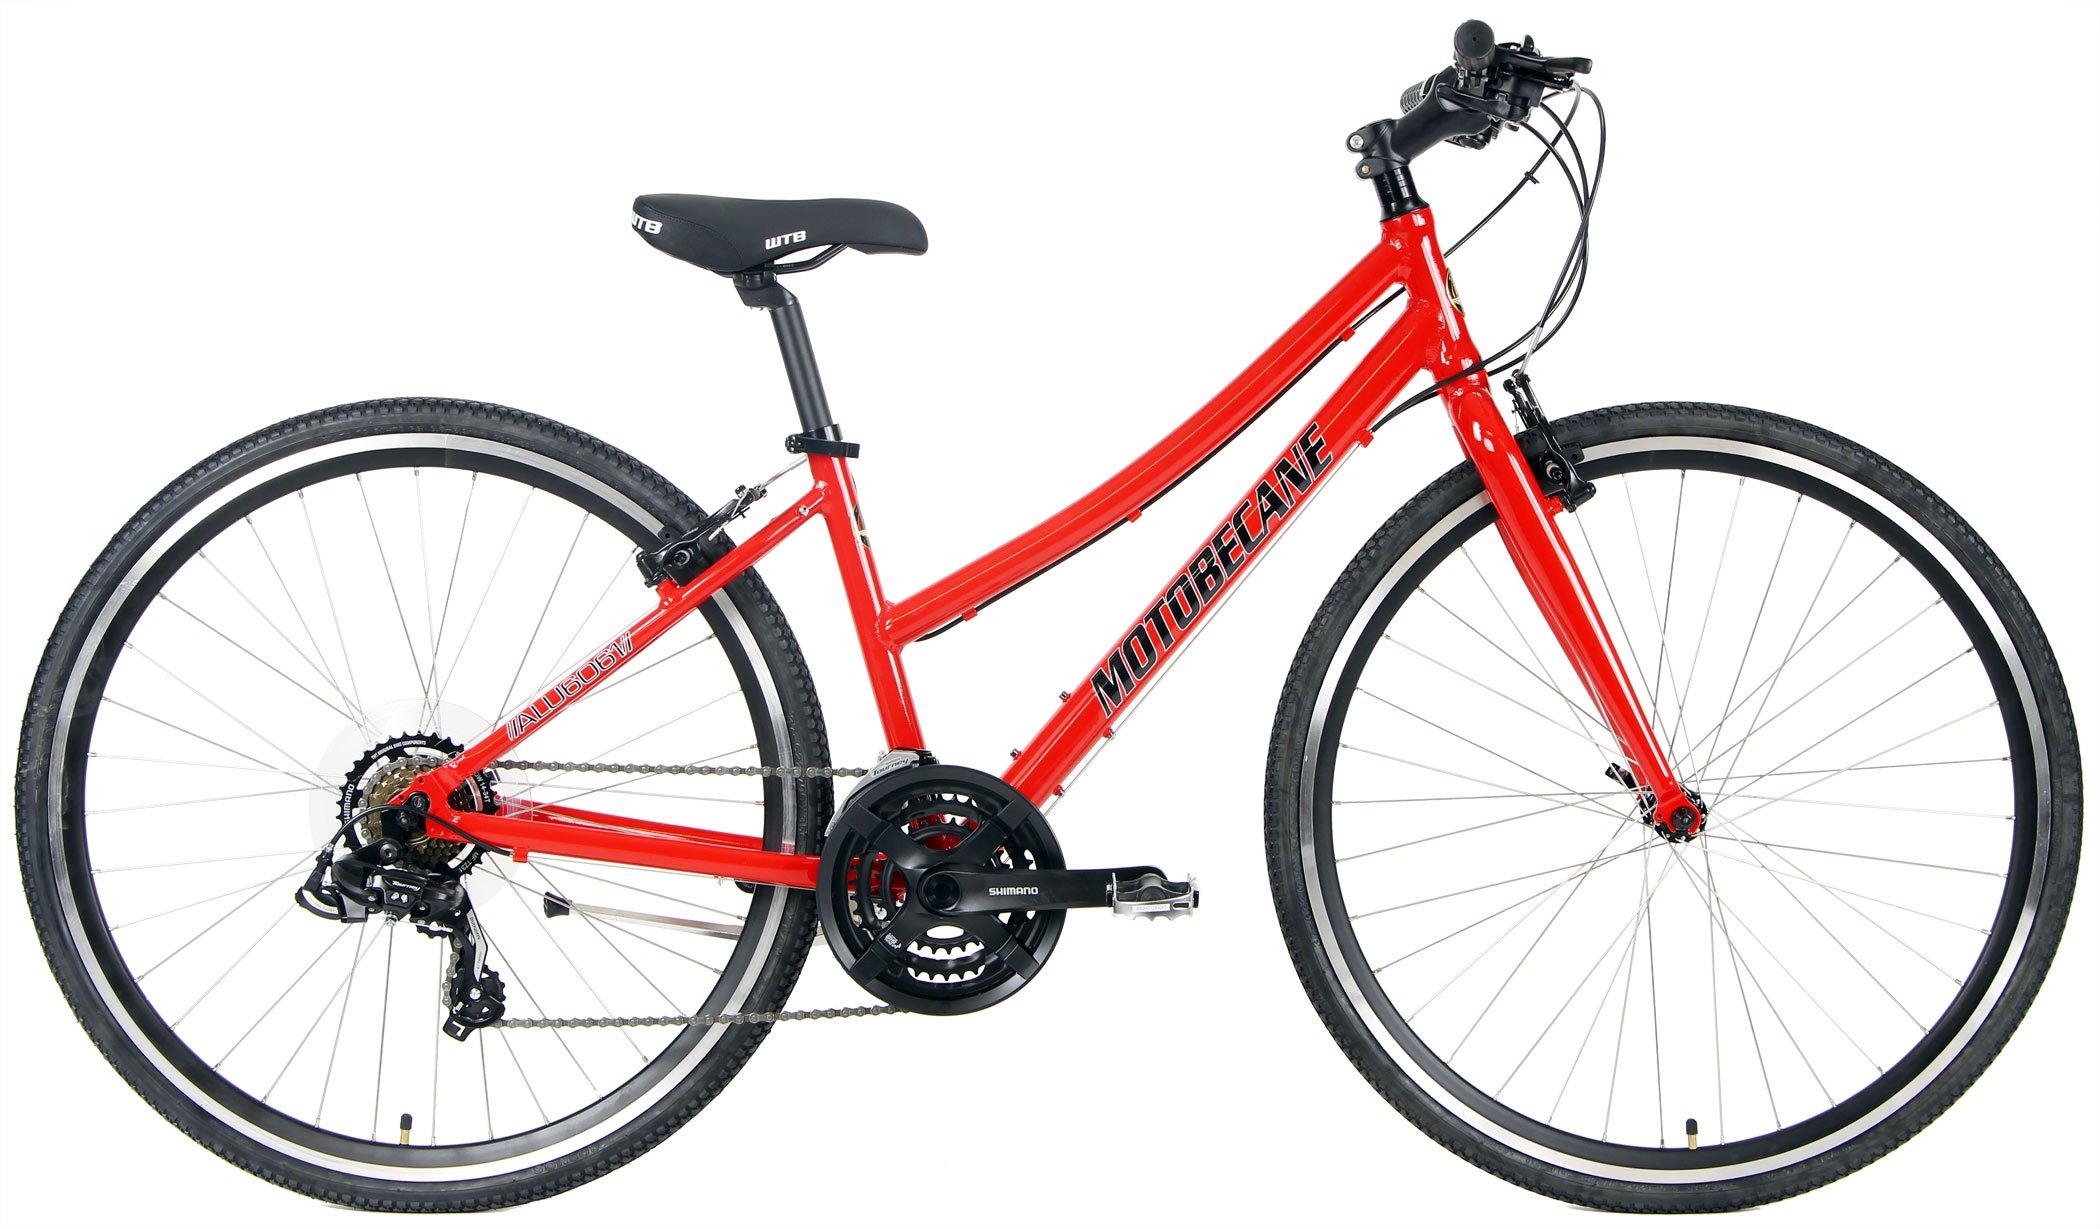 Motobecane Shimano Equipped Aluminum Bicycle